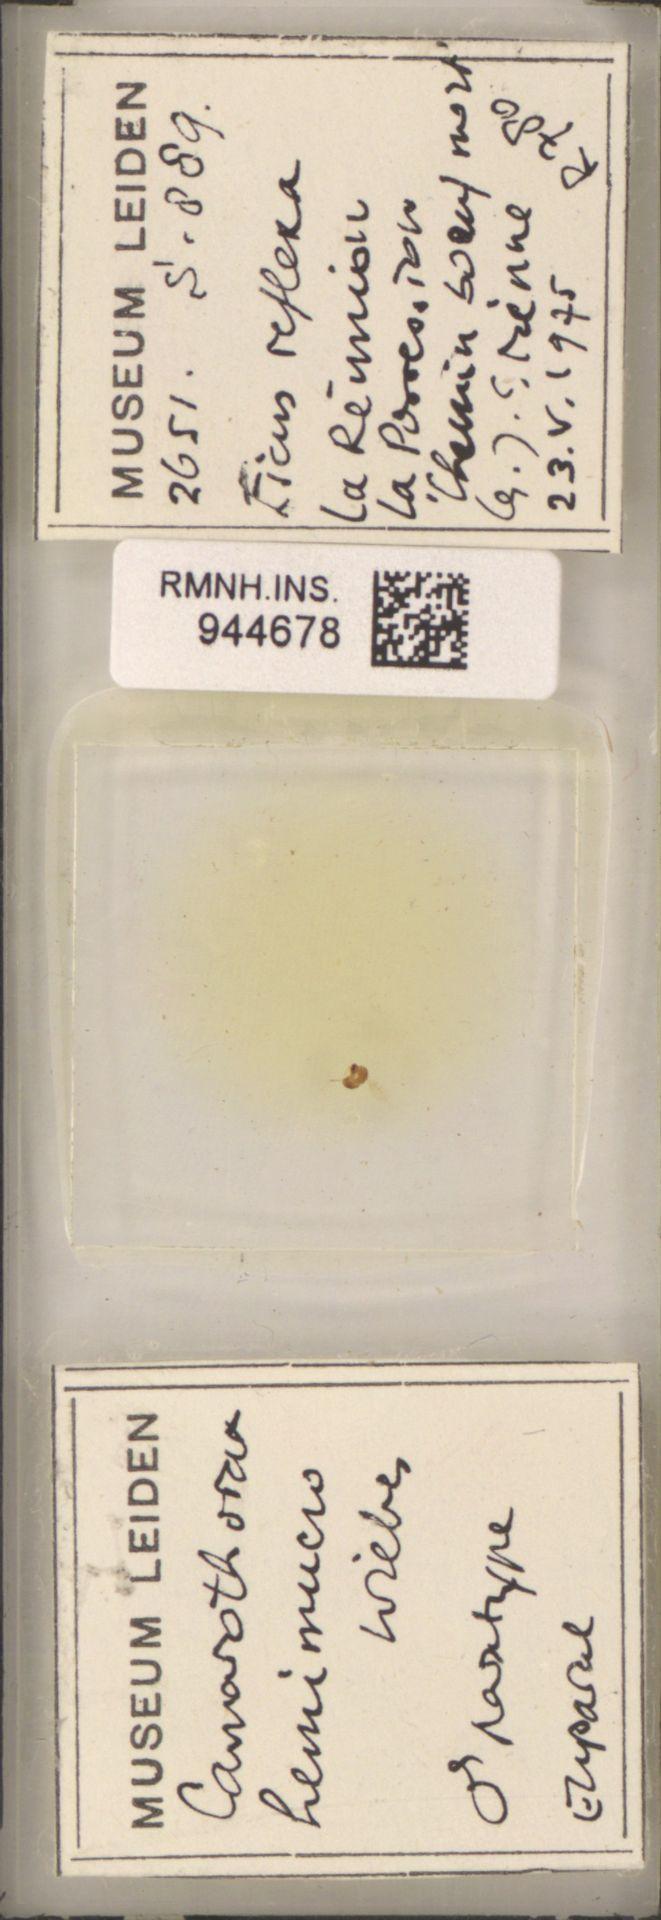 RMNH.INS.944678 | Camarothorax hemimucro Wiebes